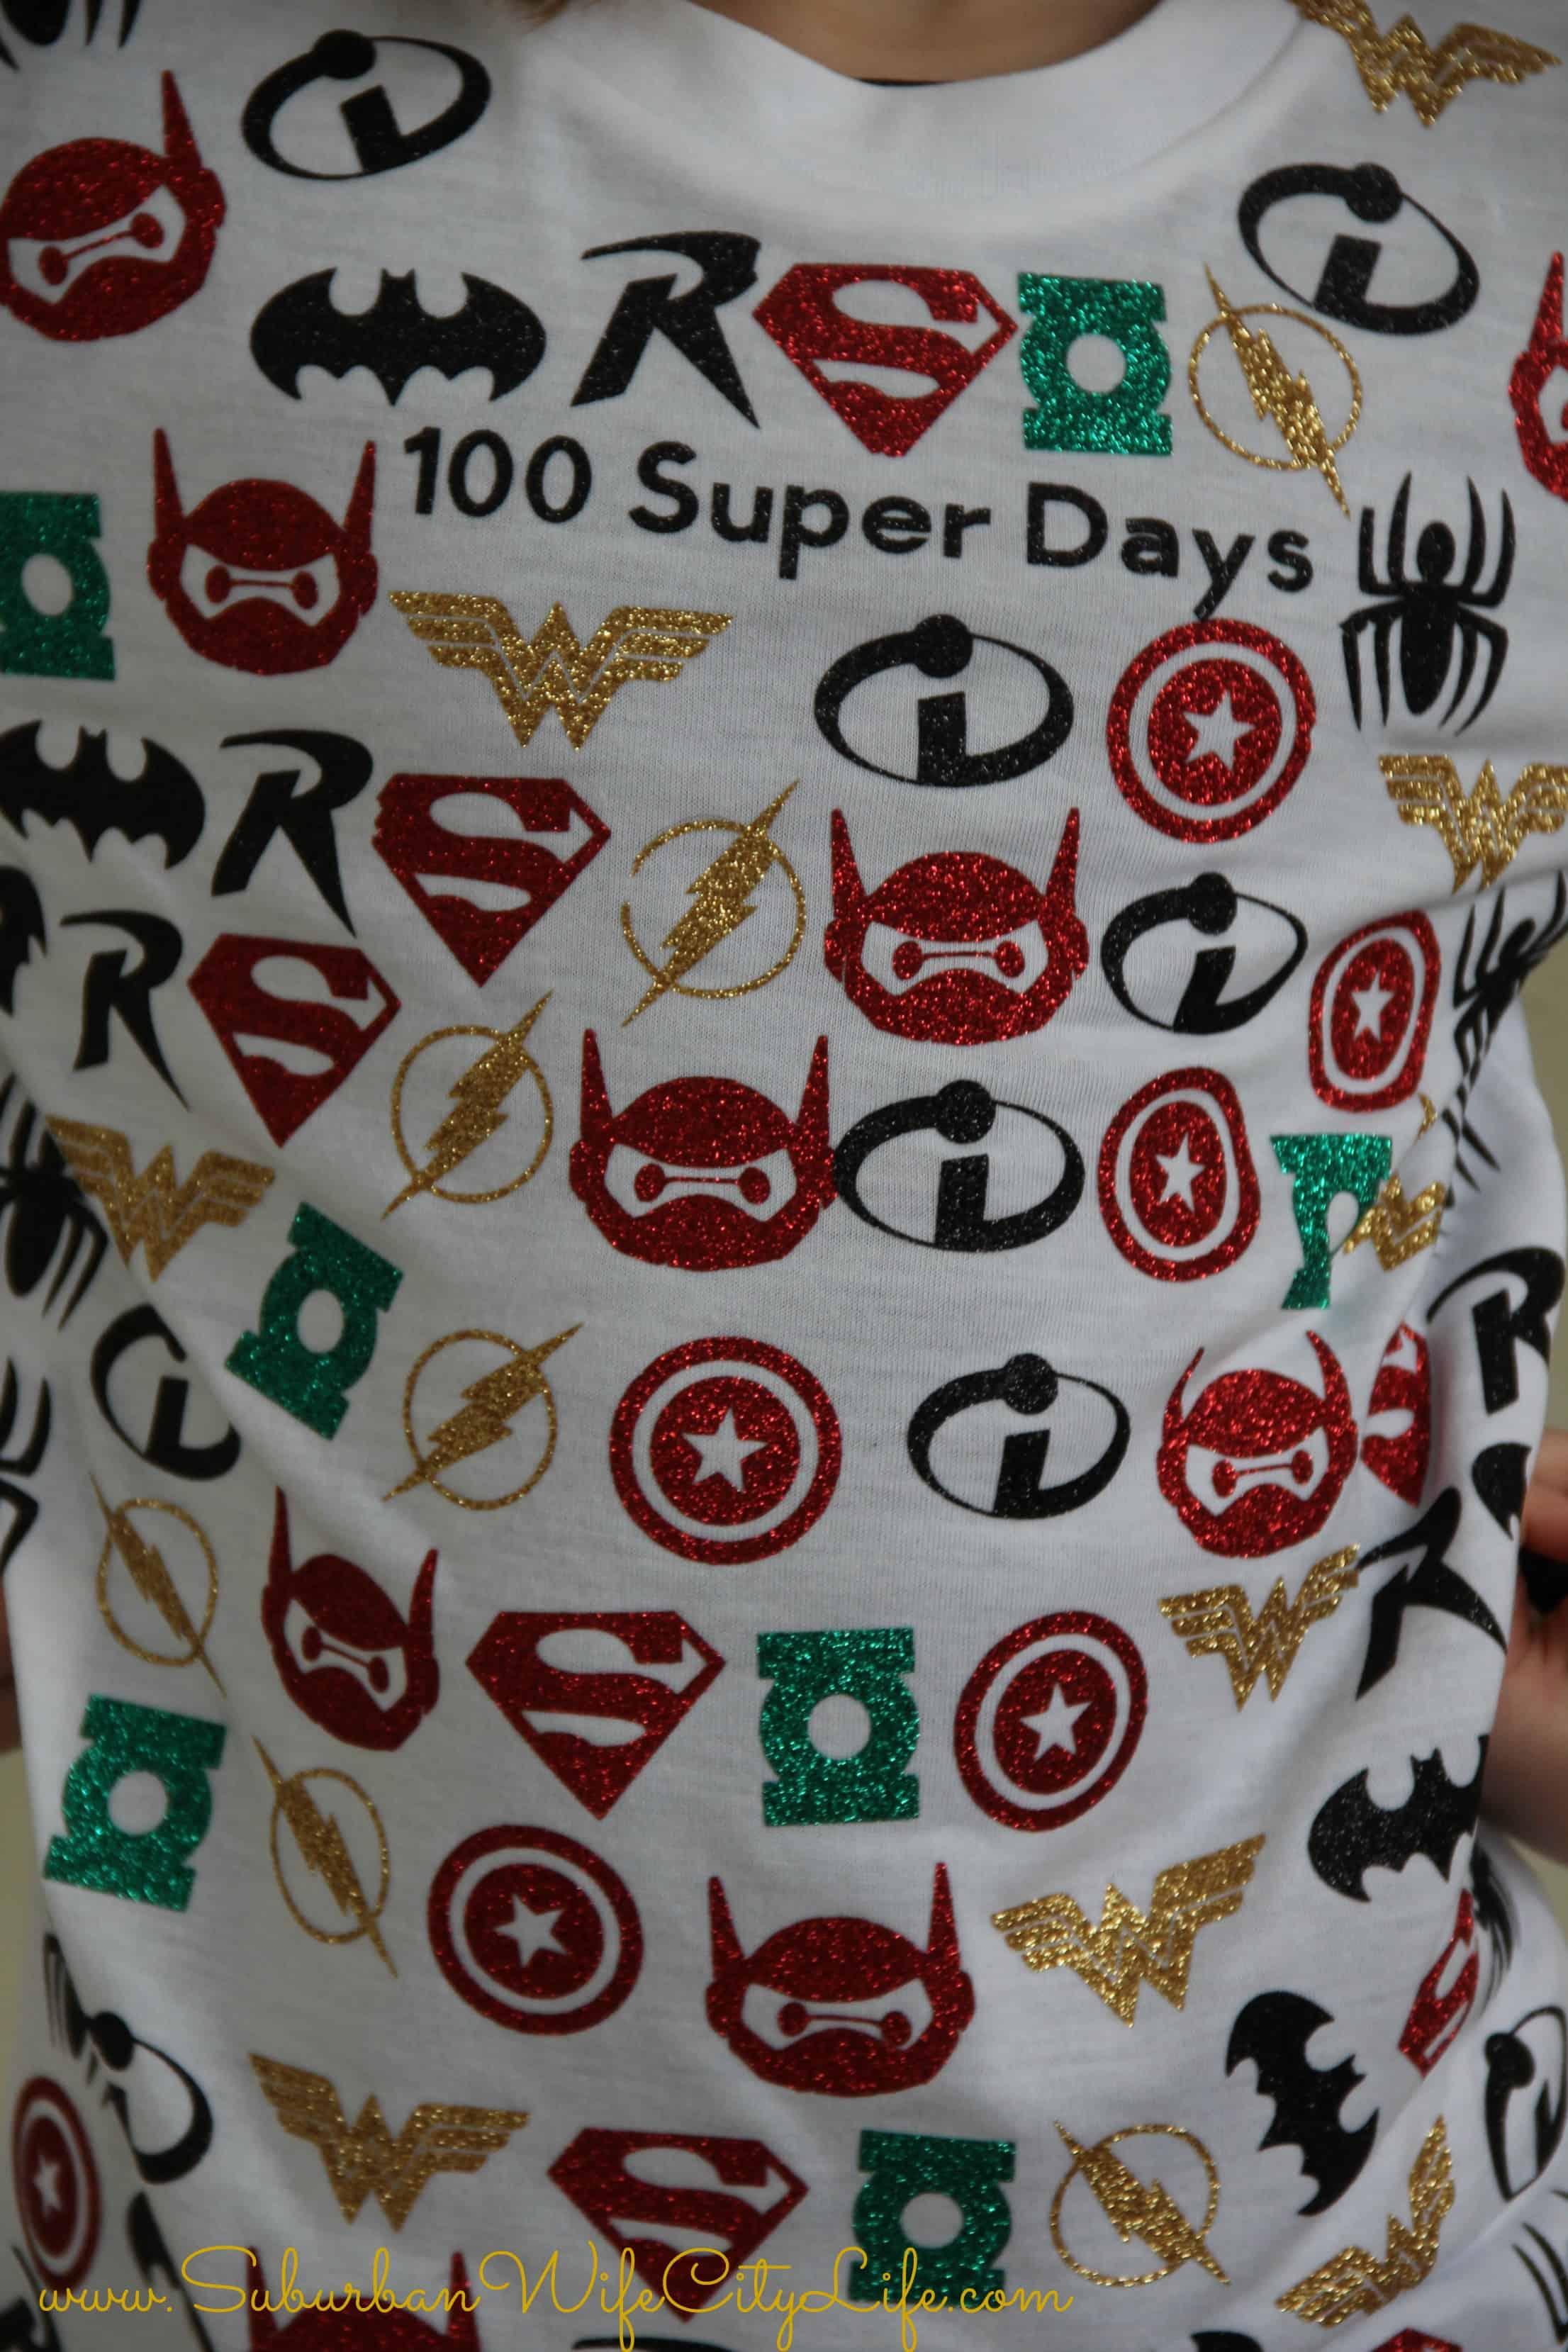 100 Super Days Shirt Suburban Wife City Life